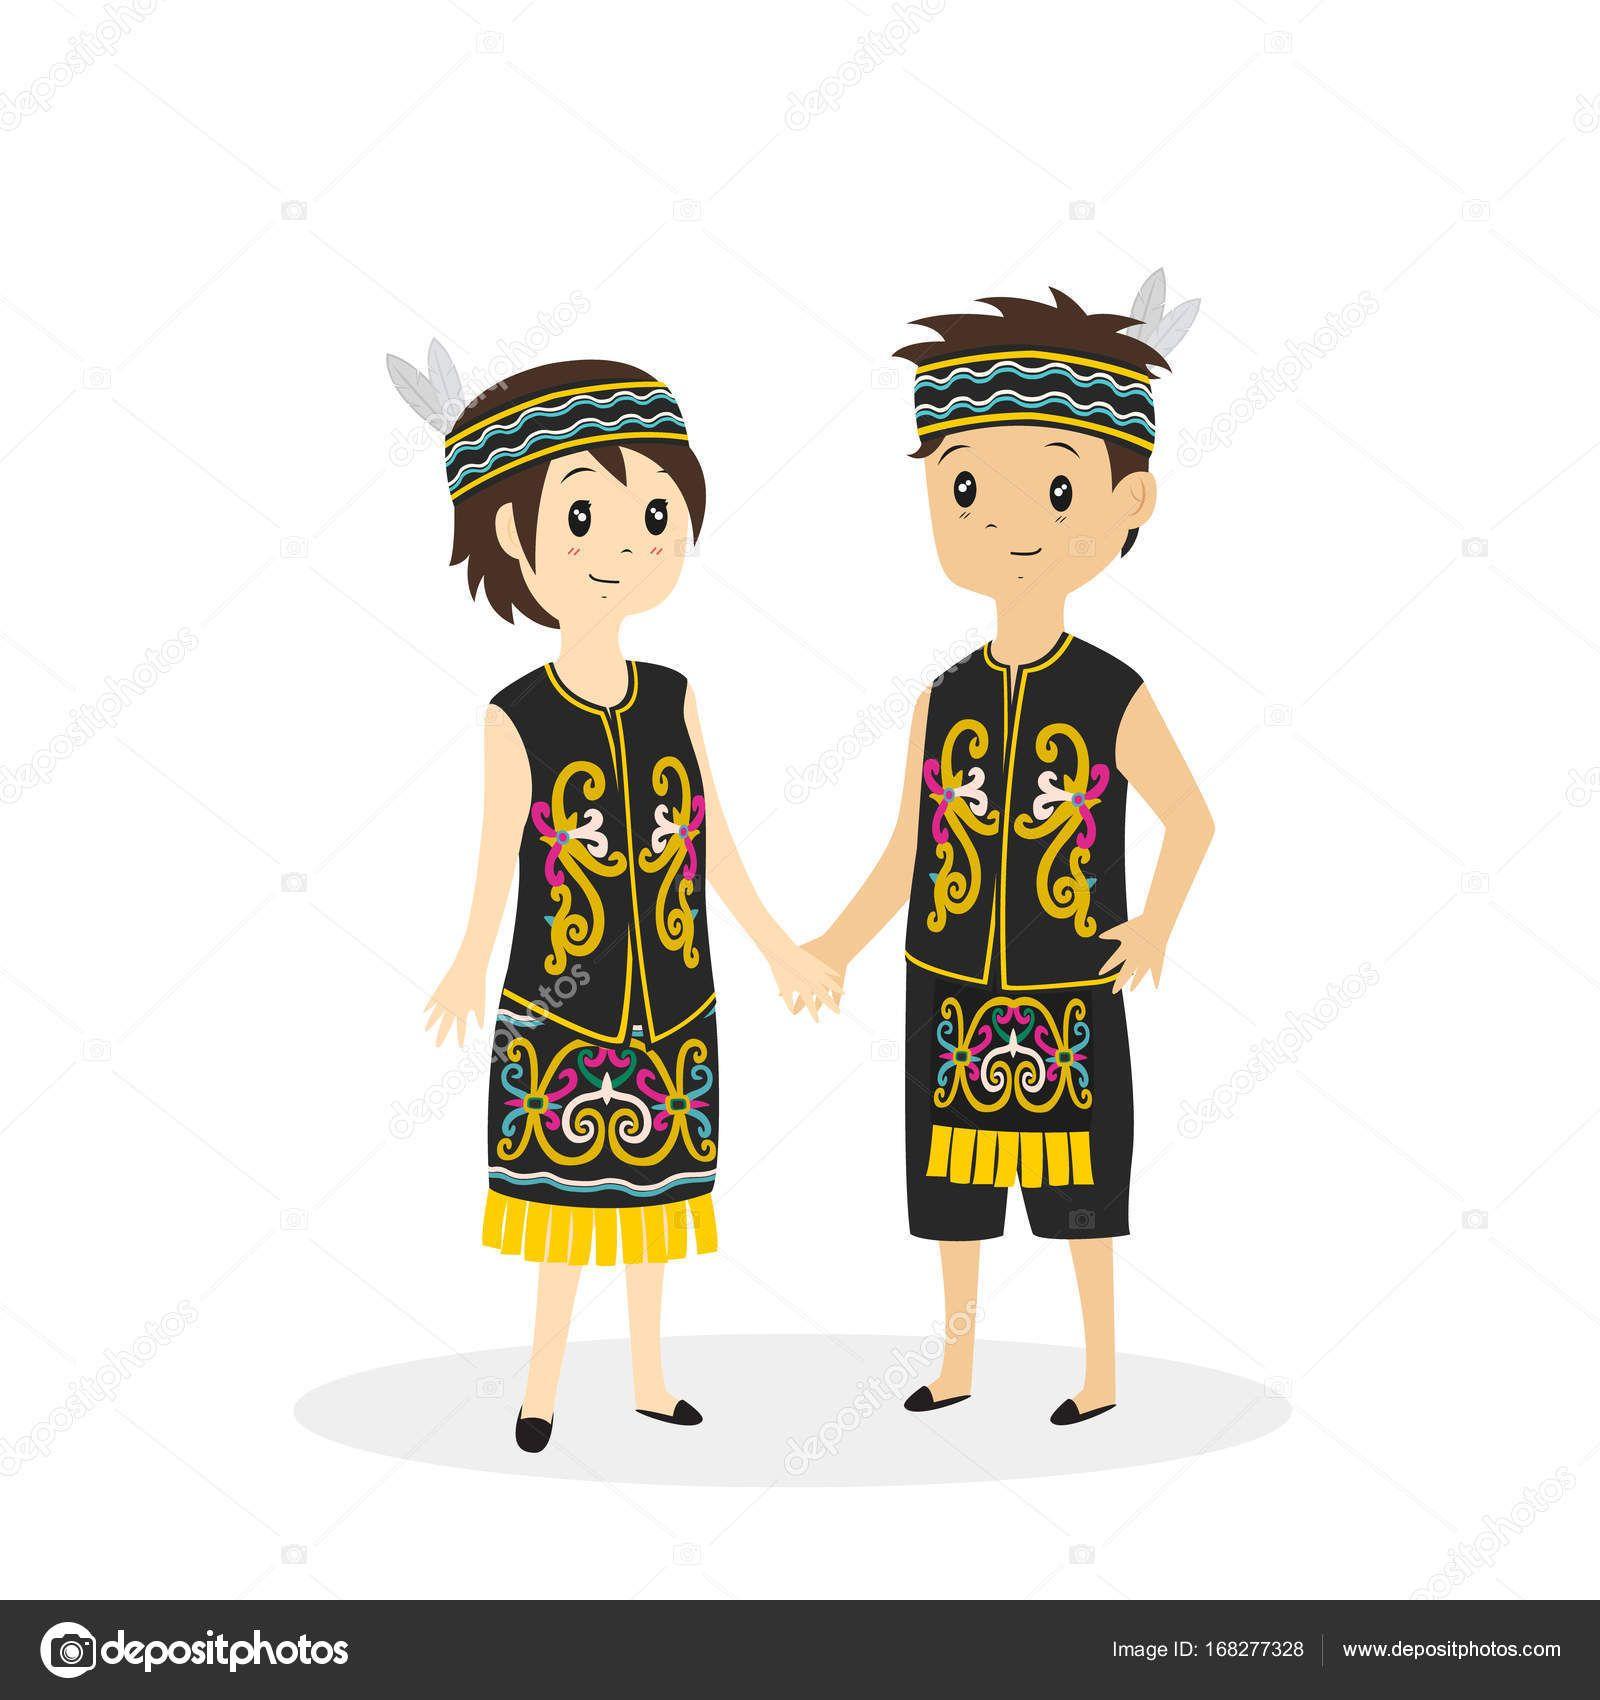 Pakaian Adat Bali Kartun